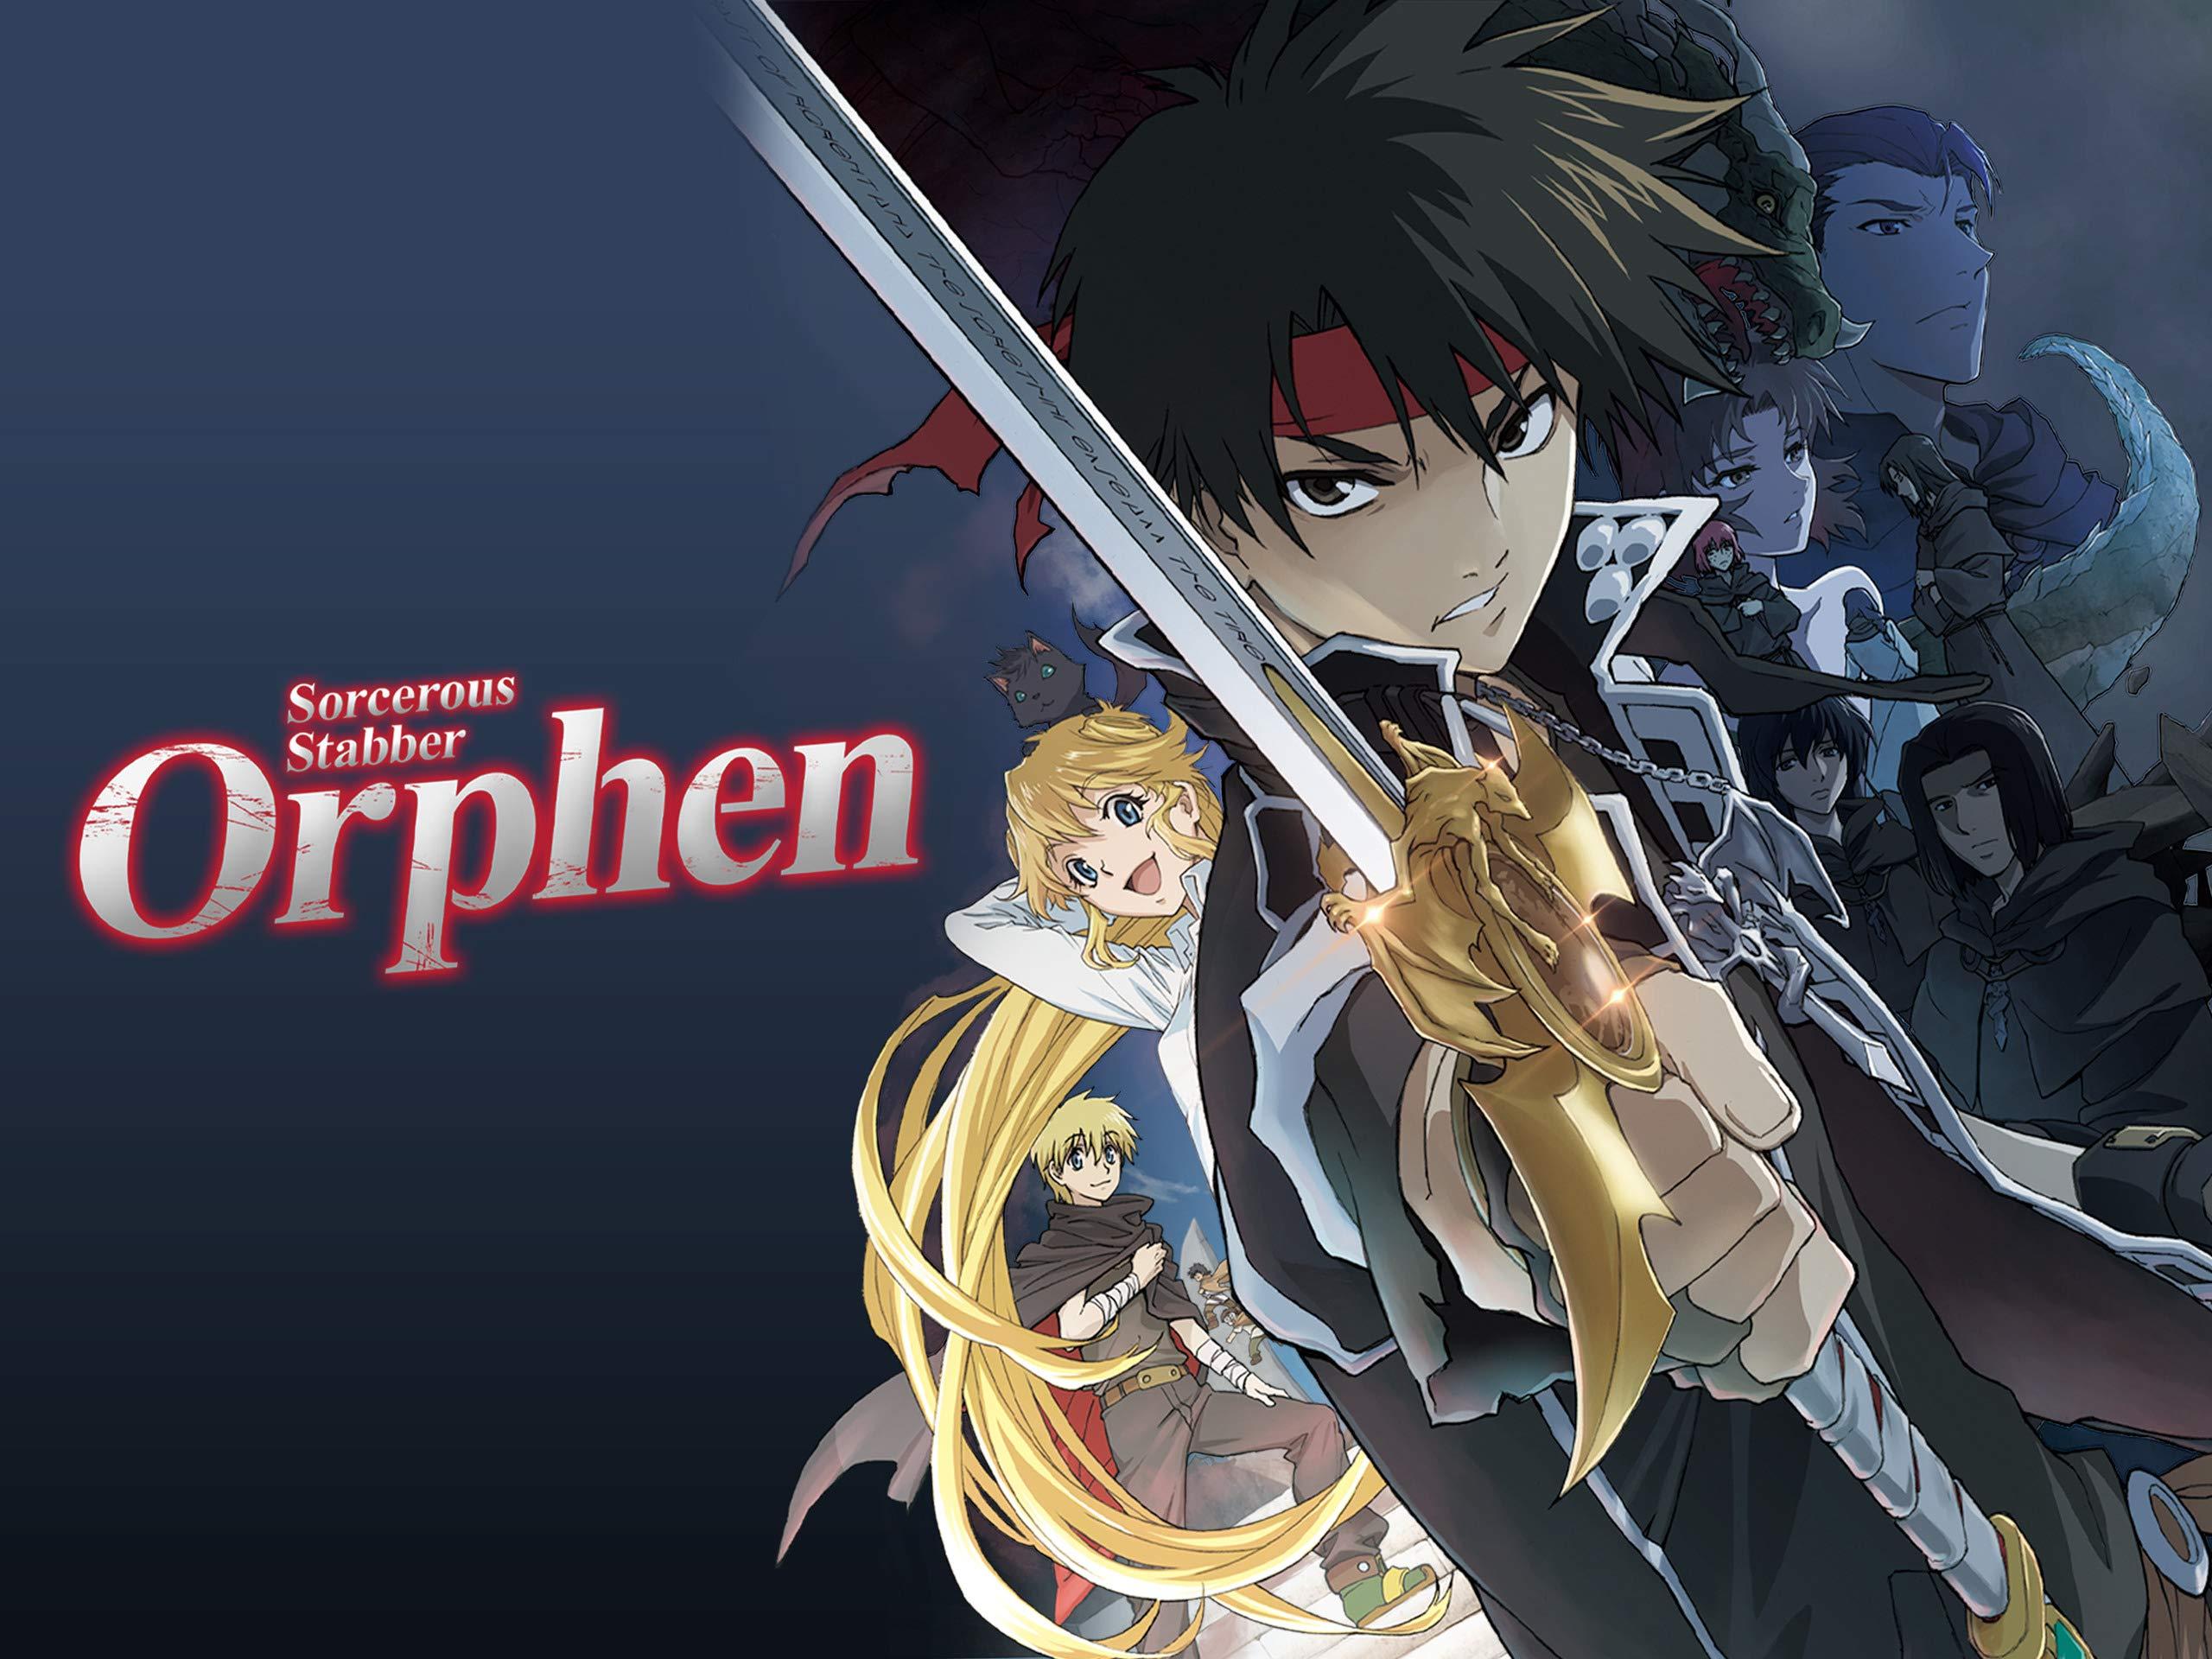 seconda stagione per Sorcerous Stabber Orphen